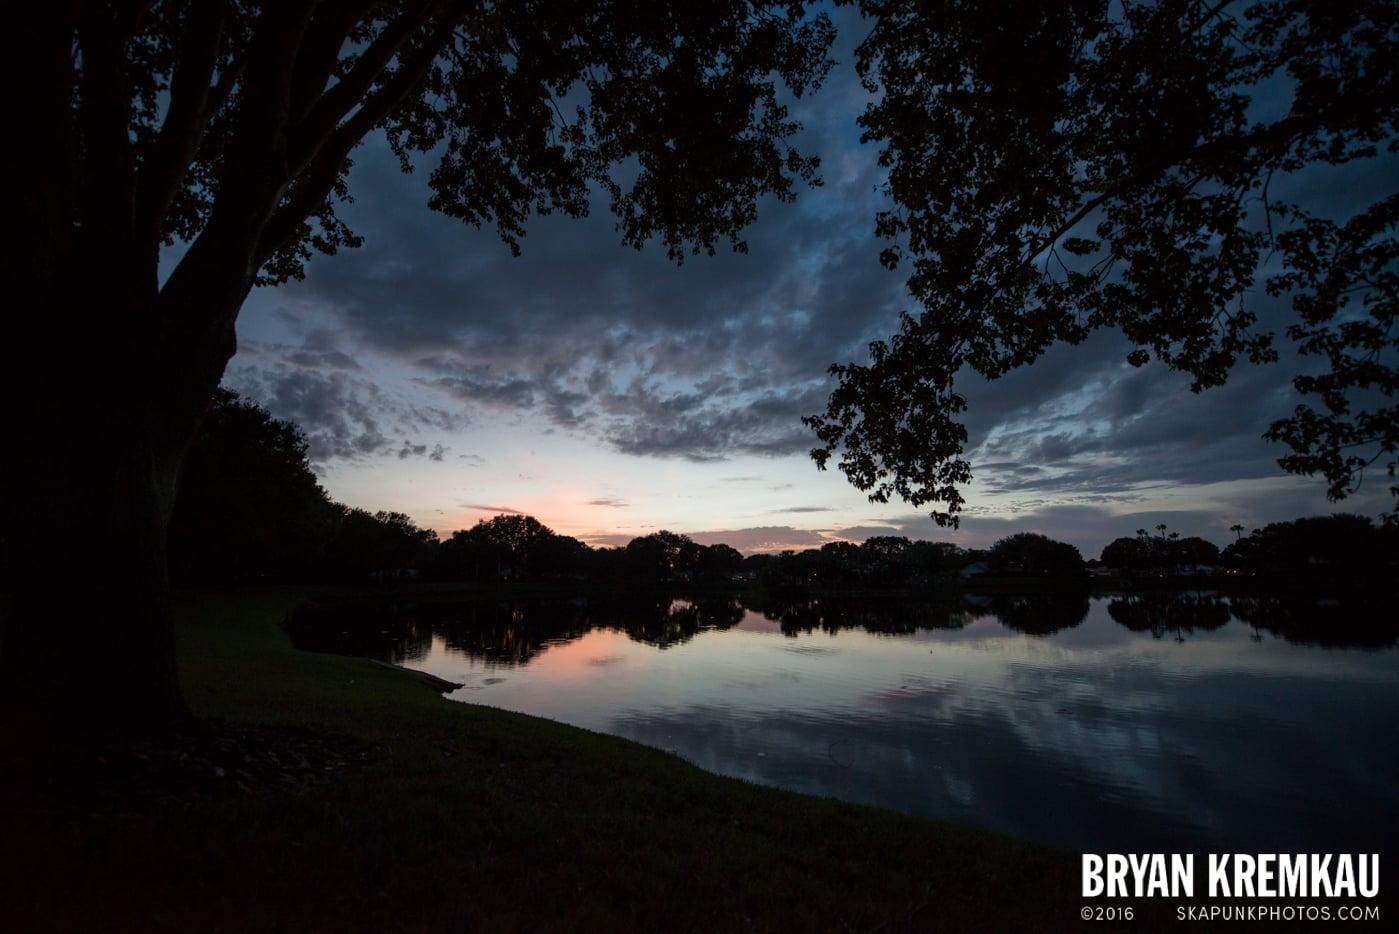 Sunsets, Astrophotography & Birds @ Venice, Florida - 10.25.14 - 11.5.14 (3)